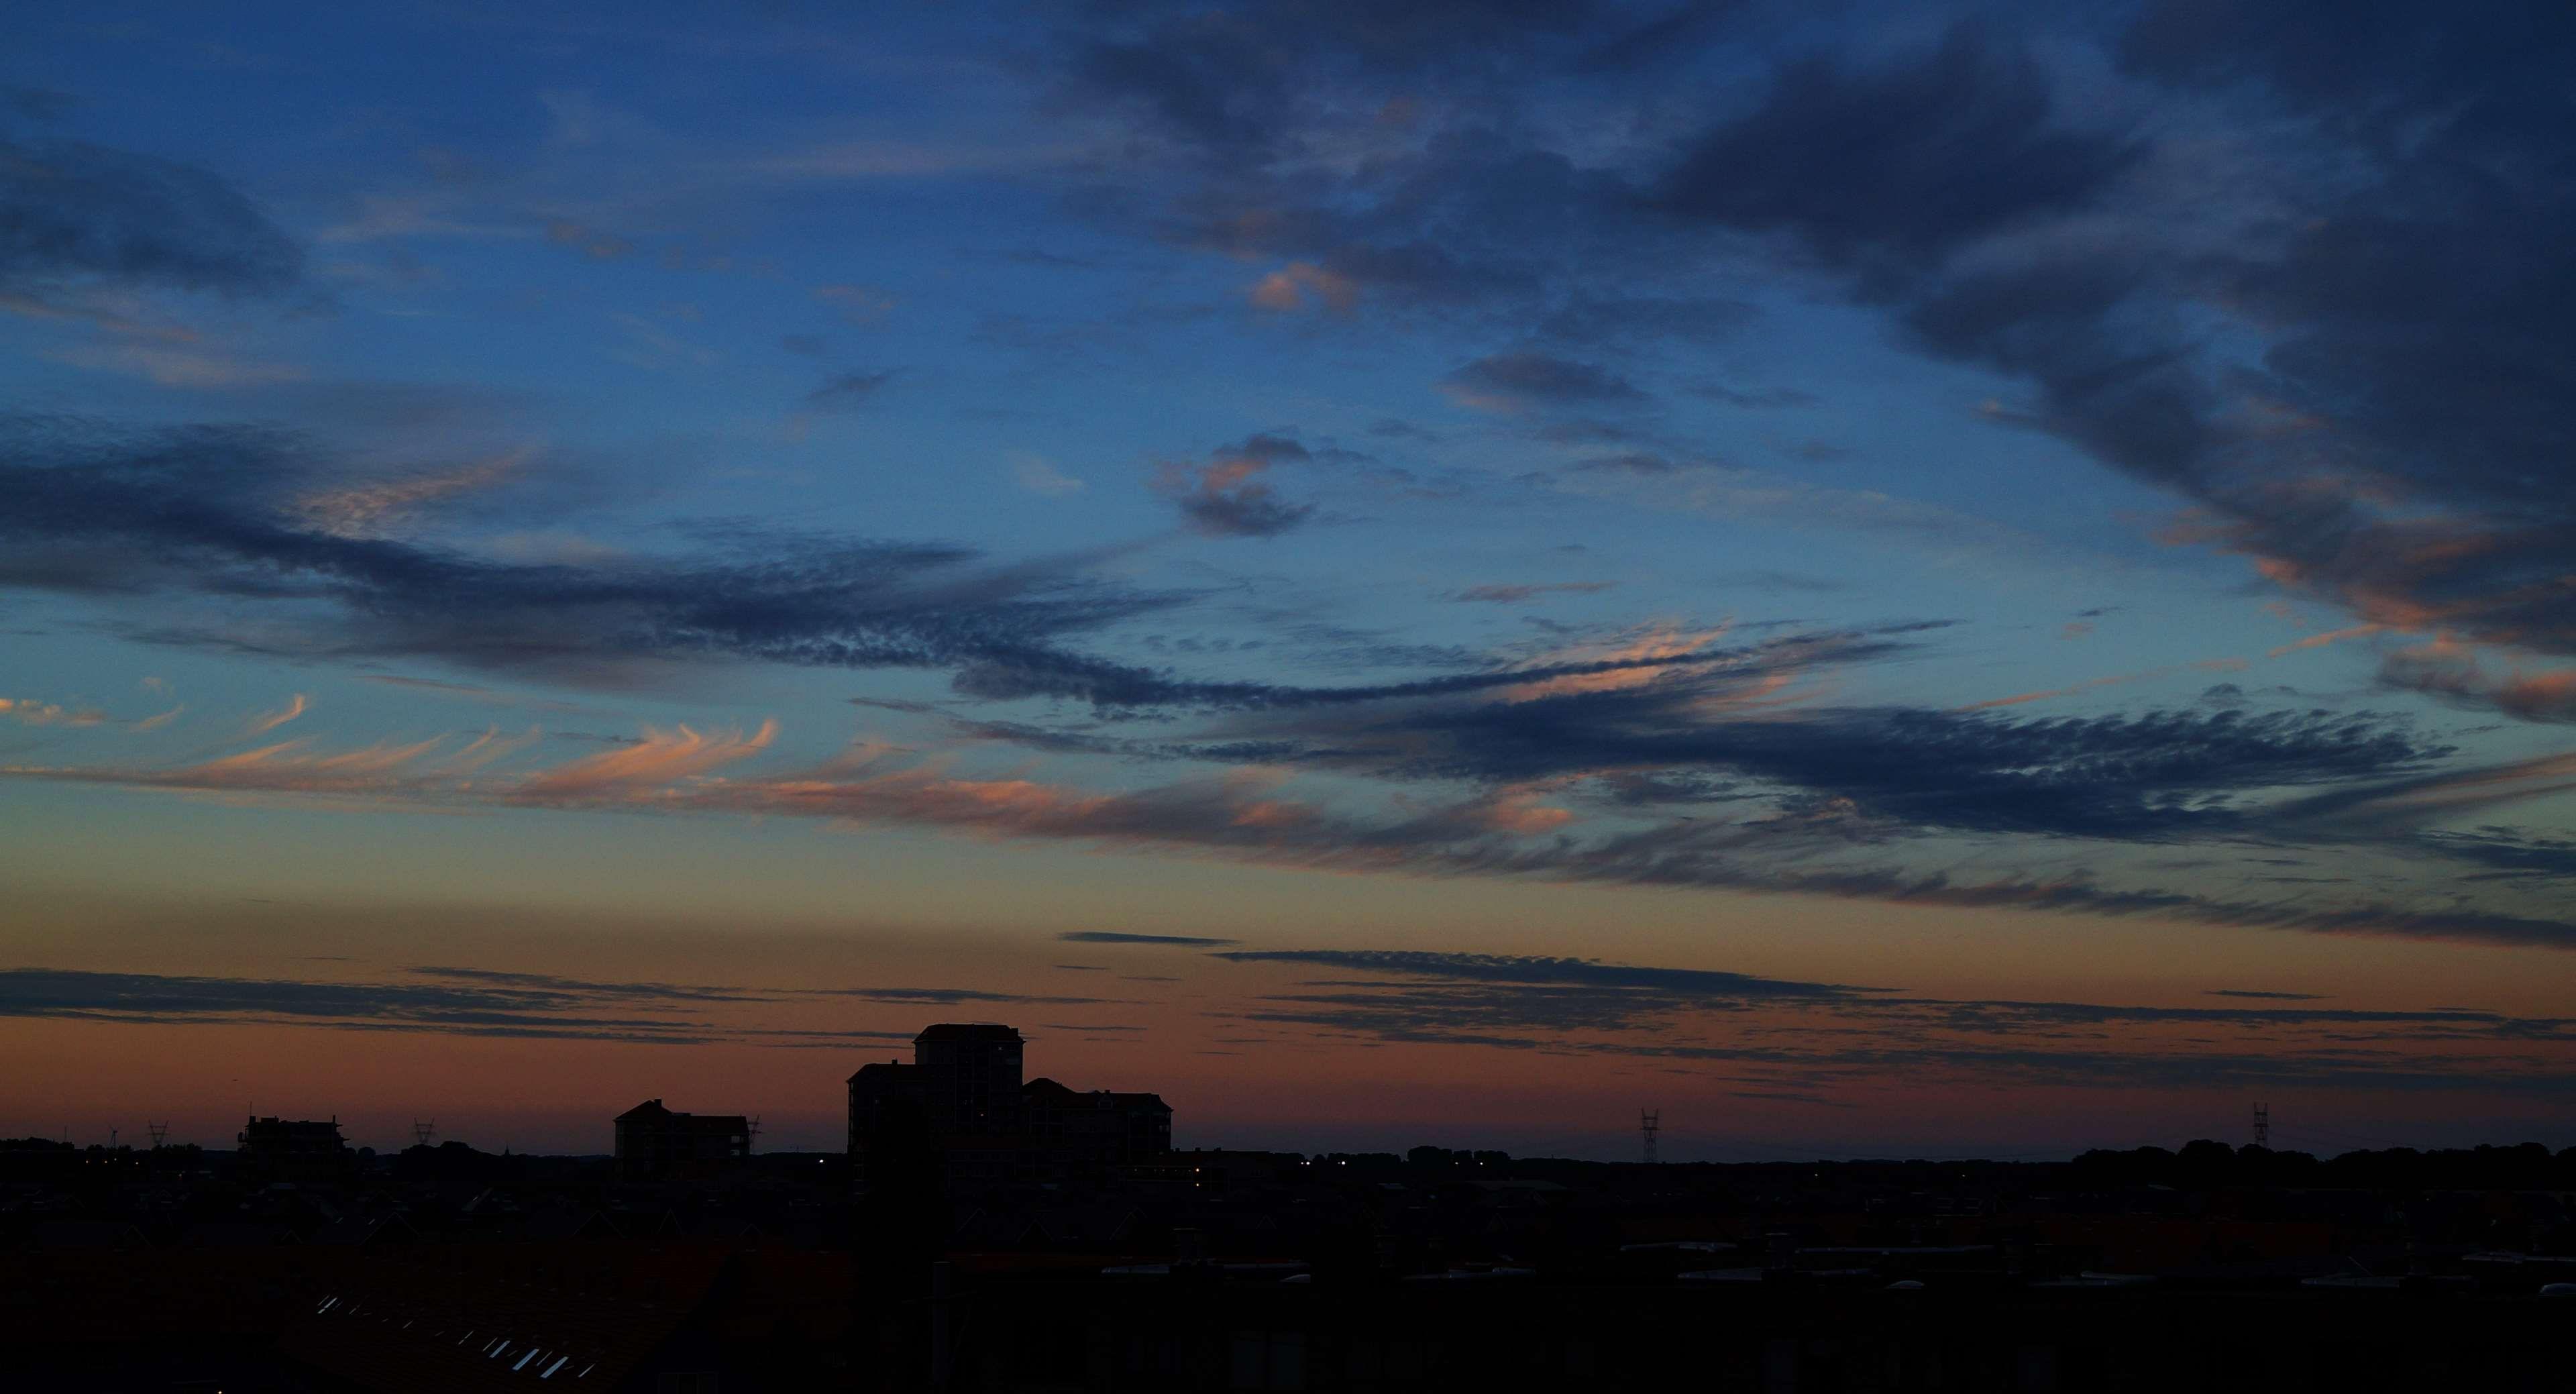 Clouds Dark Dawn Evening Landscape Nature Night Outdoors Scenic Silhouette Sky Sunset 4k Wallpaper